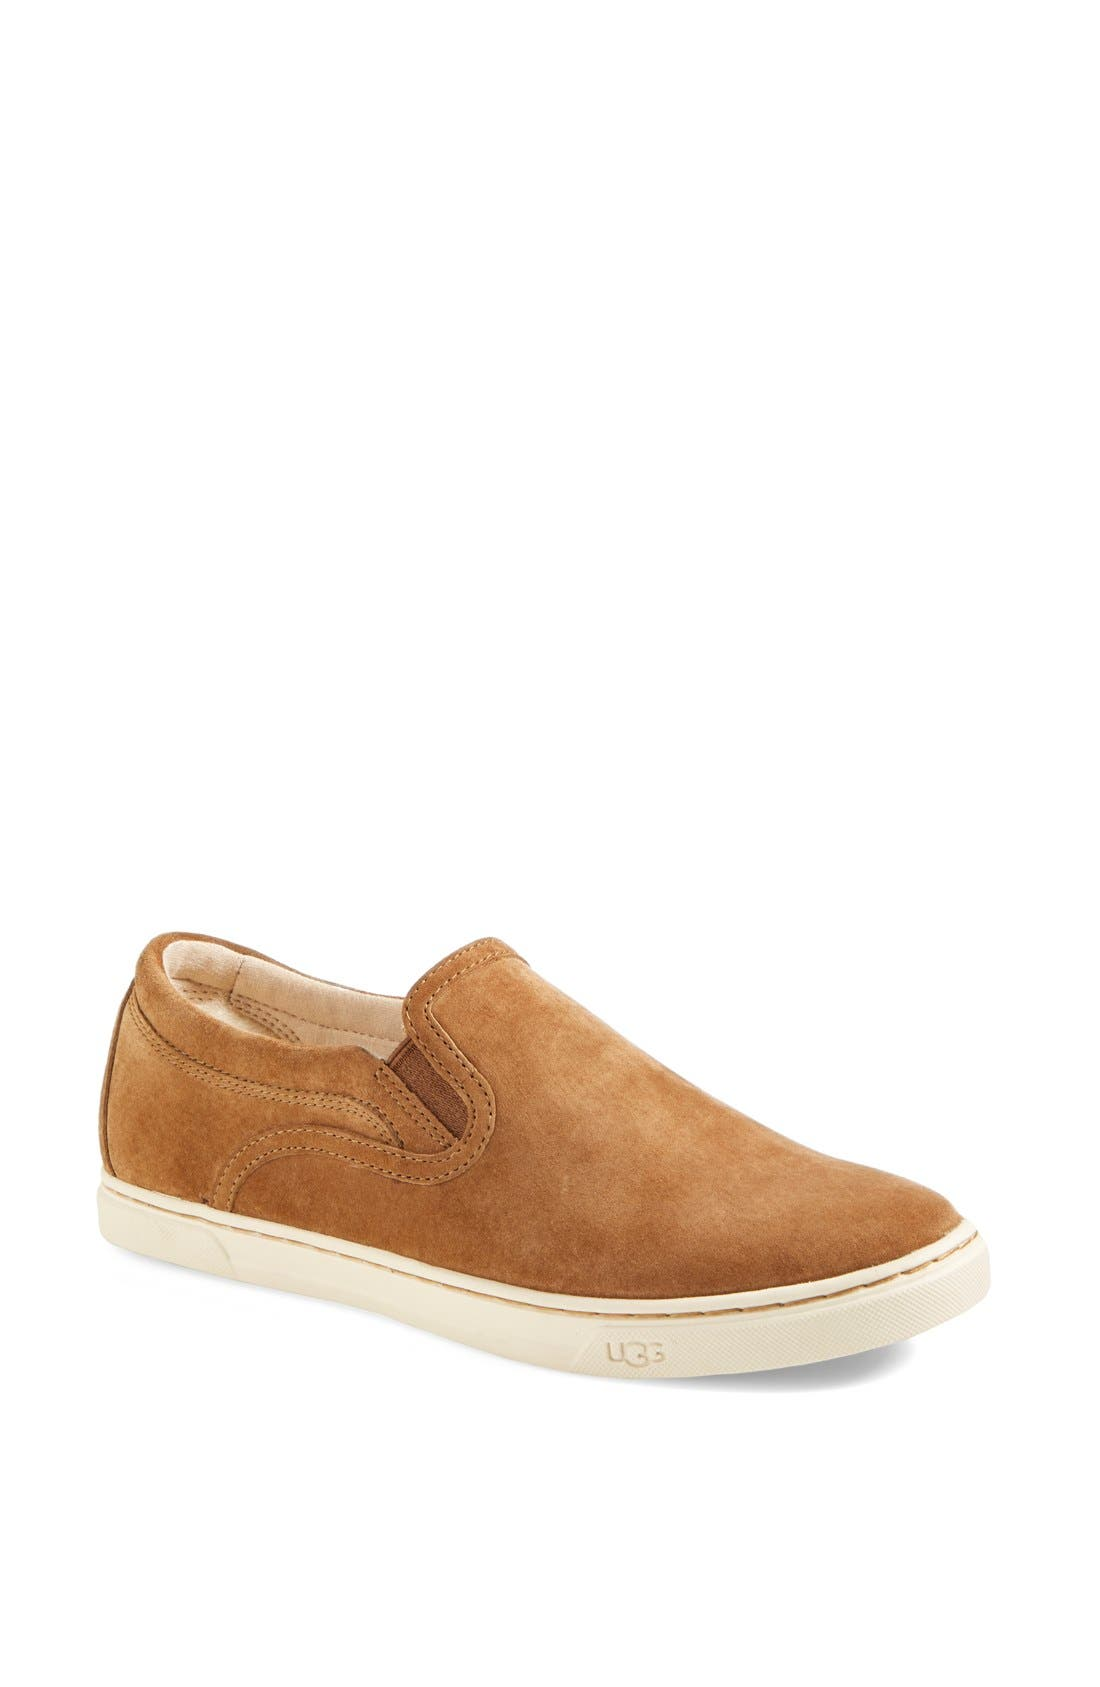 UGG<SUP>®</SUP> Fierce Water Resistant Suede Slip-On Sneaker, Main, color, 219